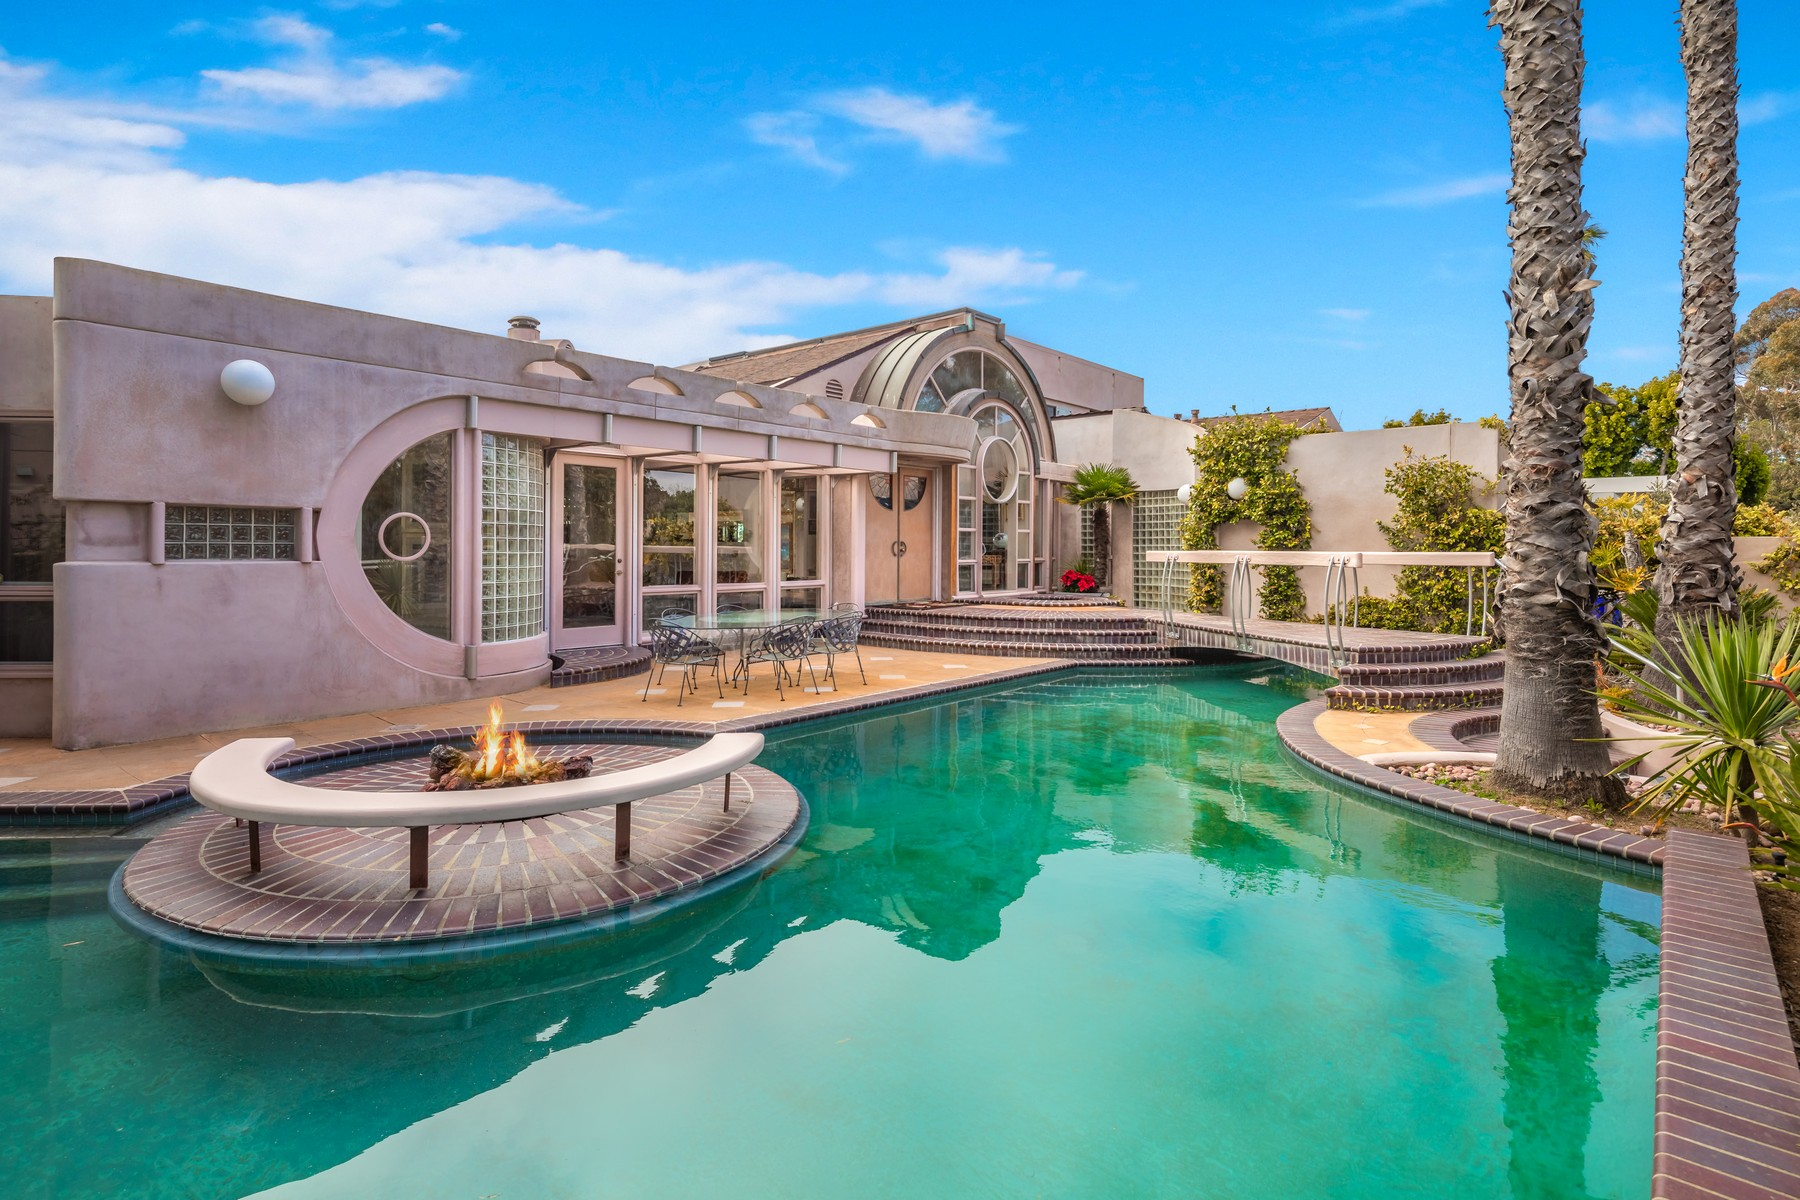 Single Family Home for Active at 7191 Encelia Drive La Jolla, California 92037 United States